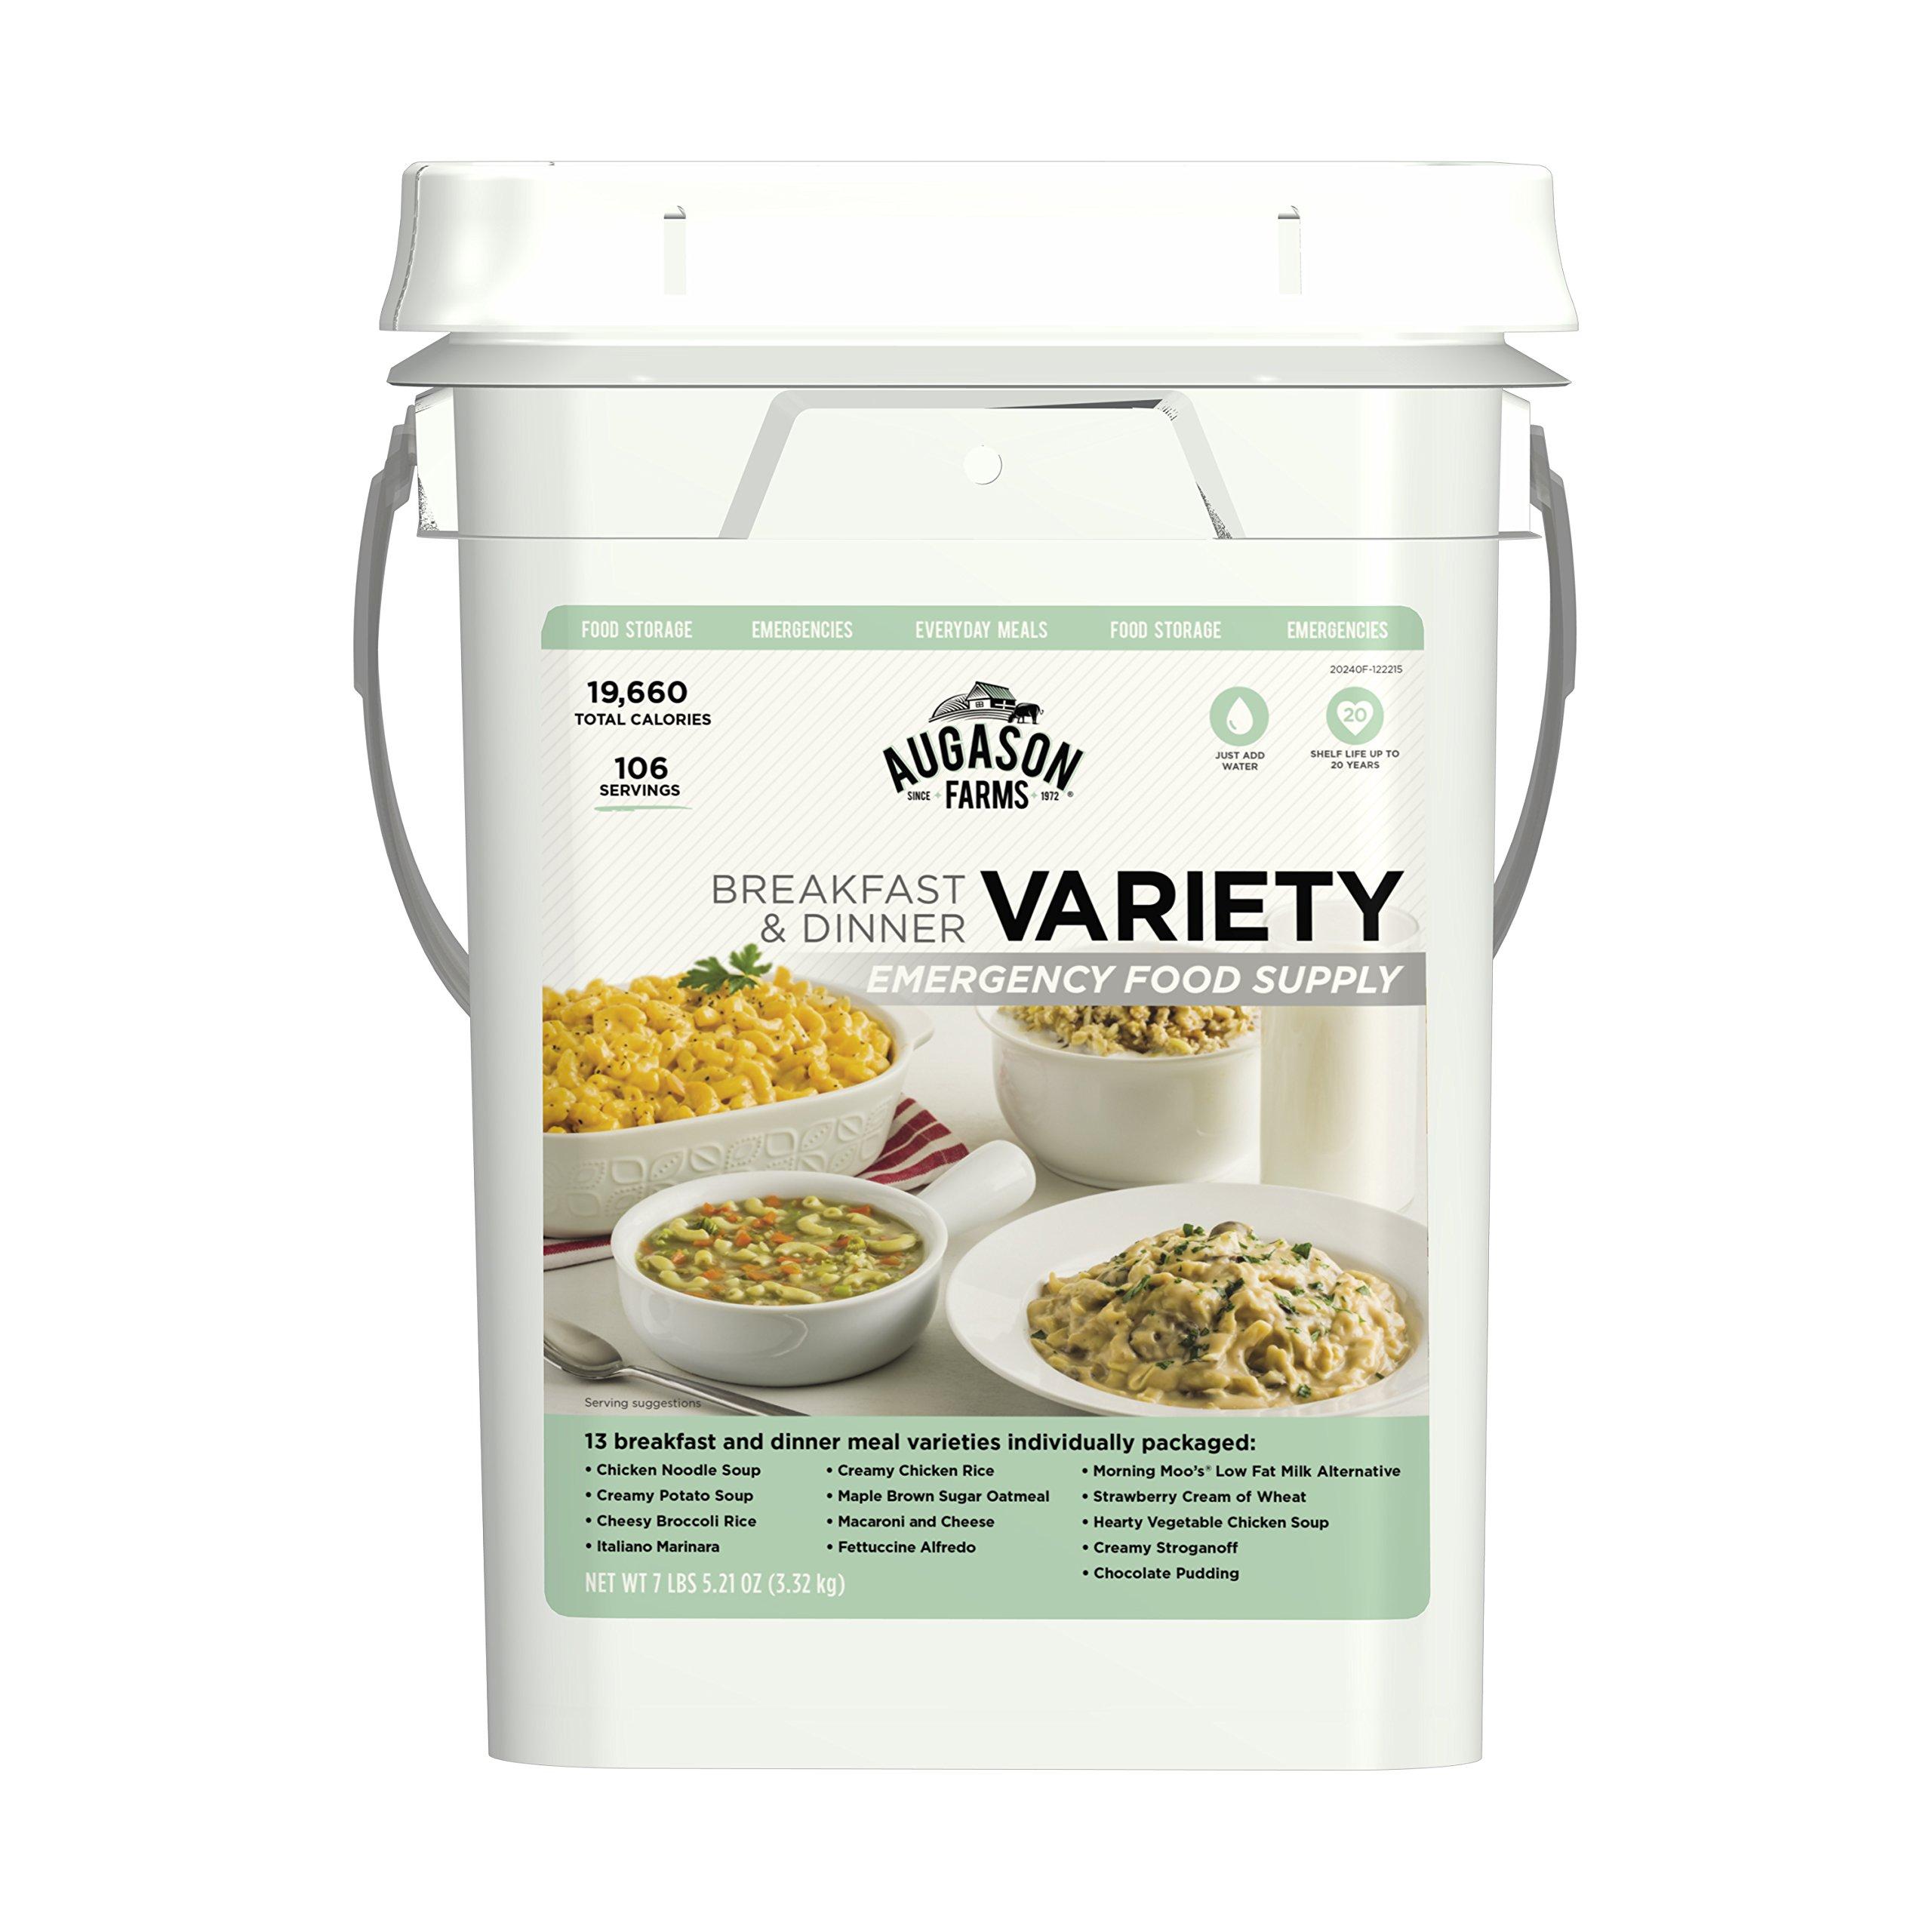 Augason Farms Breakfast & Dinner Variety Emergency Food Supply 7 lbs 5.21 oz 4 Gallon Pail by Augason Farms (Image #1)